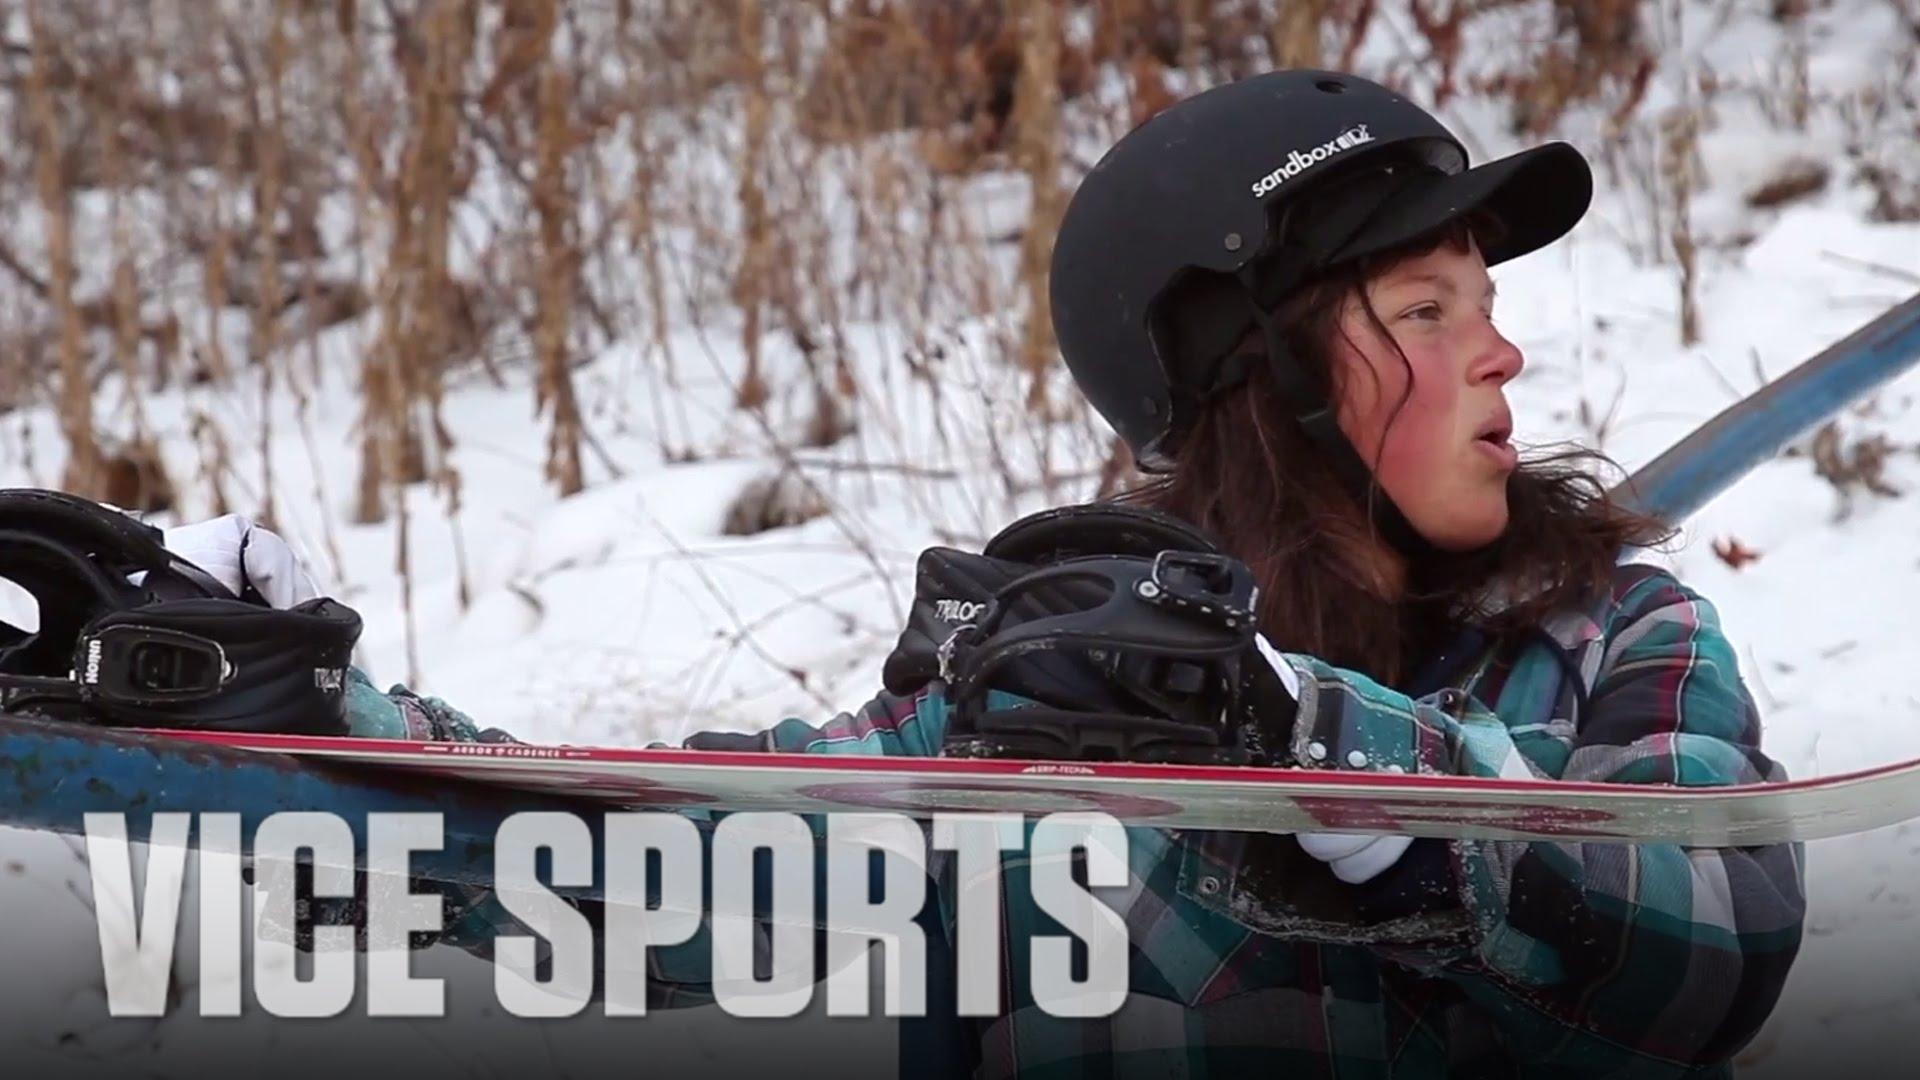 [Snow] Too Hard: Lady Shredders Part 3